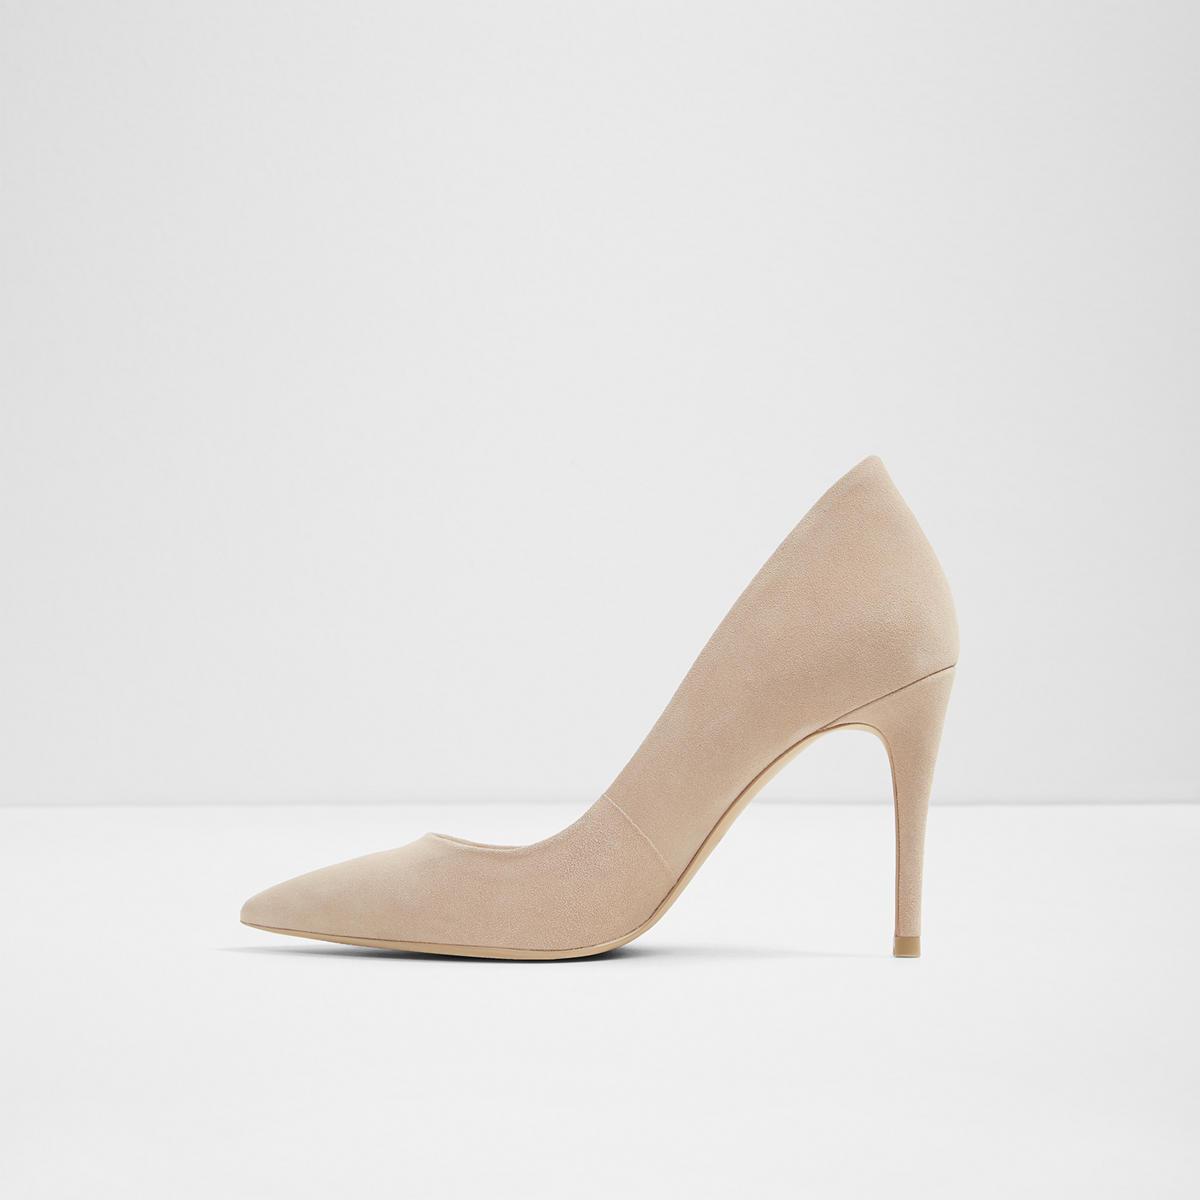 41818f66c7c Uloaviel-N Bone Suede Women s Heels